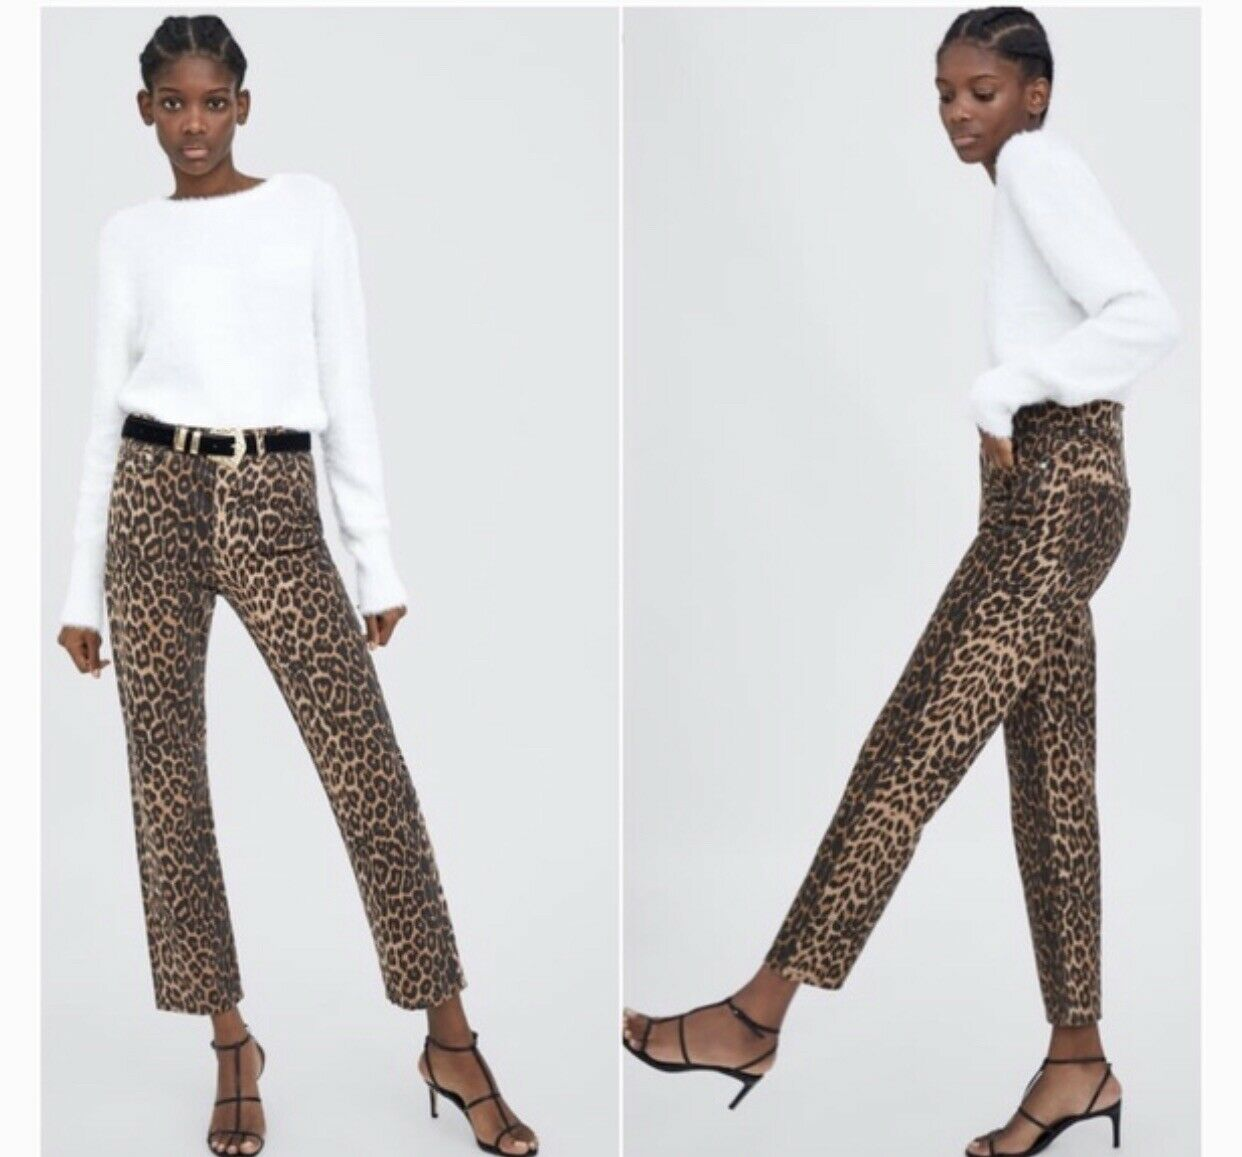 Zara Cheetah Animal Print Denim NWOT Eur 34 US 02  Sold Out High Waisted